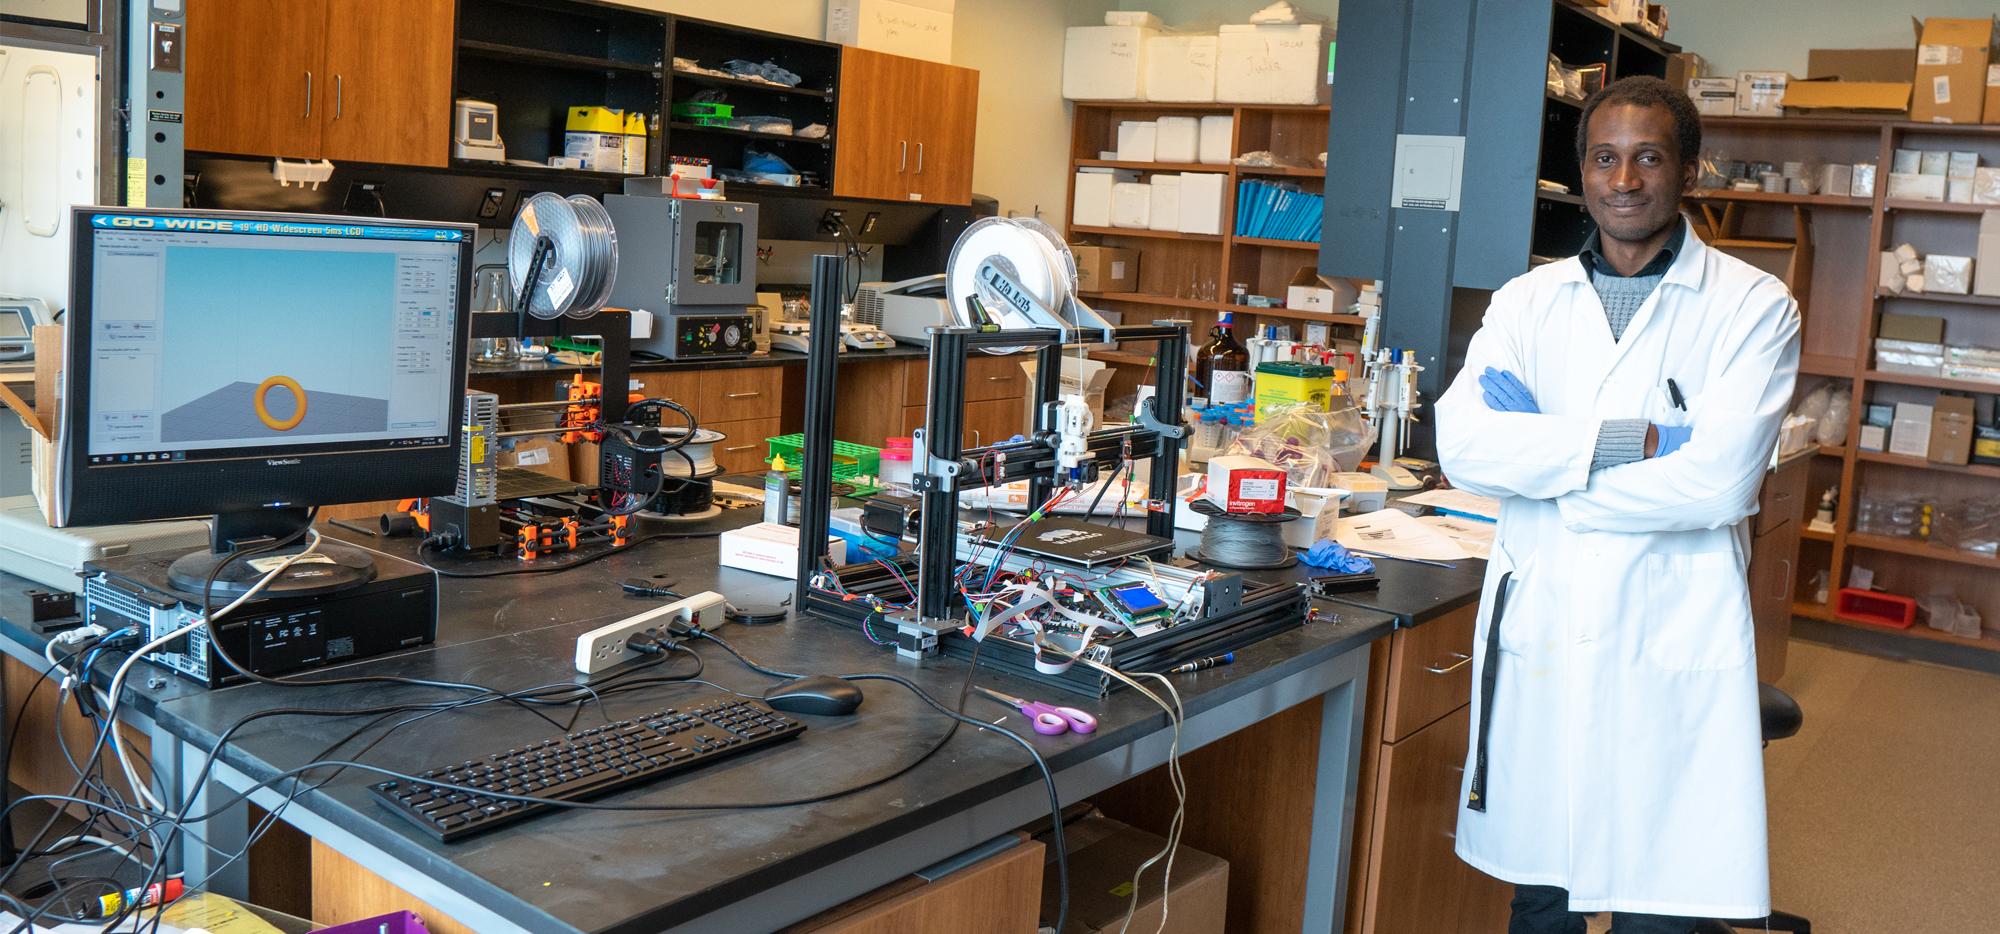 Yannick in the lab